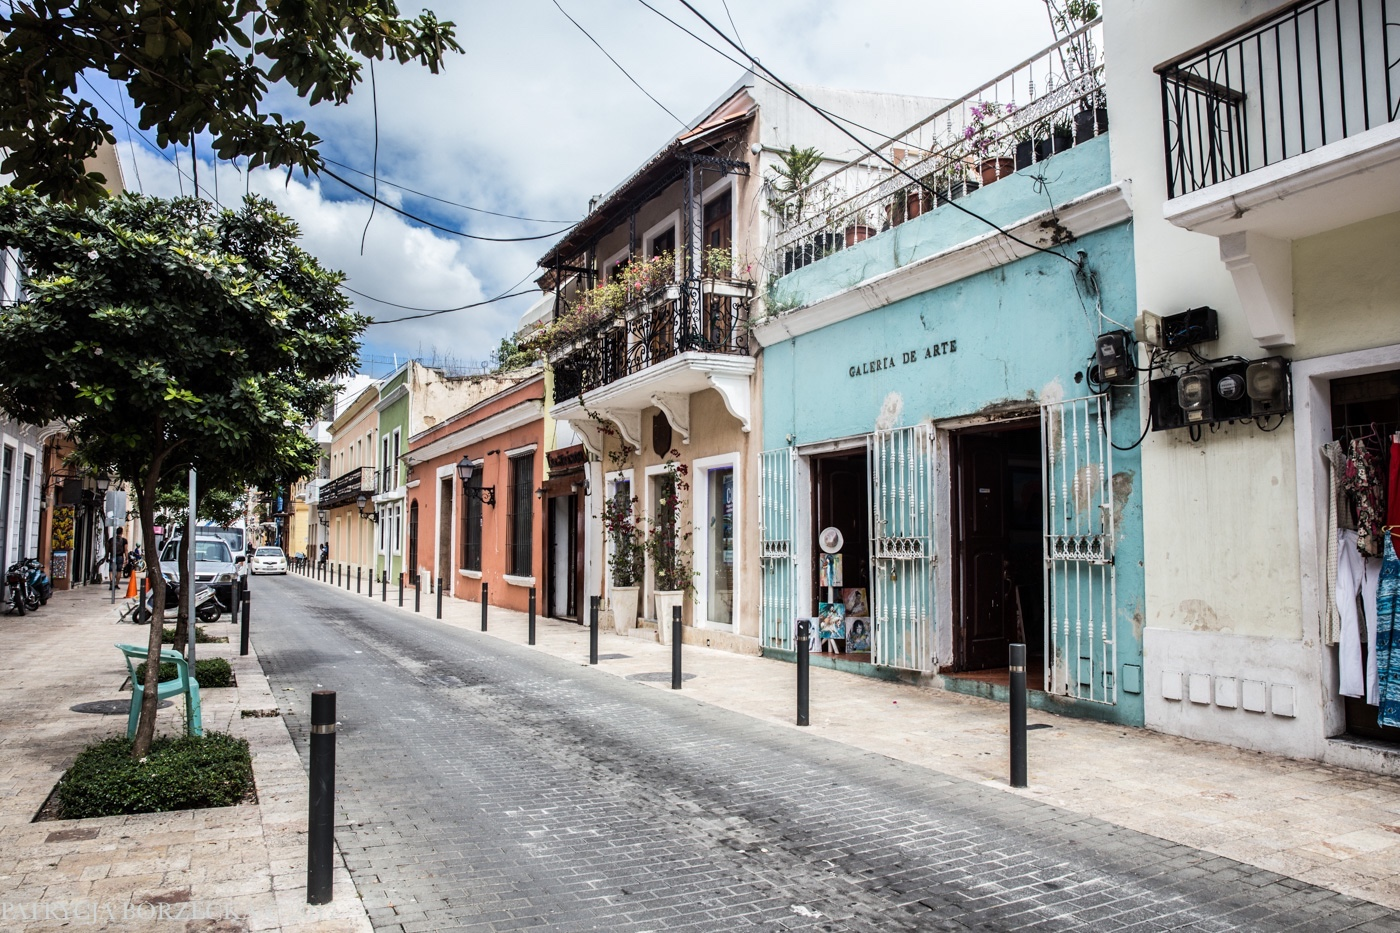 Patrycja-Borzecka-Photo-Santo-Domingo-Zona-Colonial-02